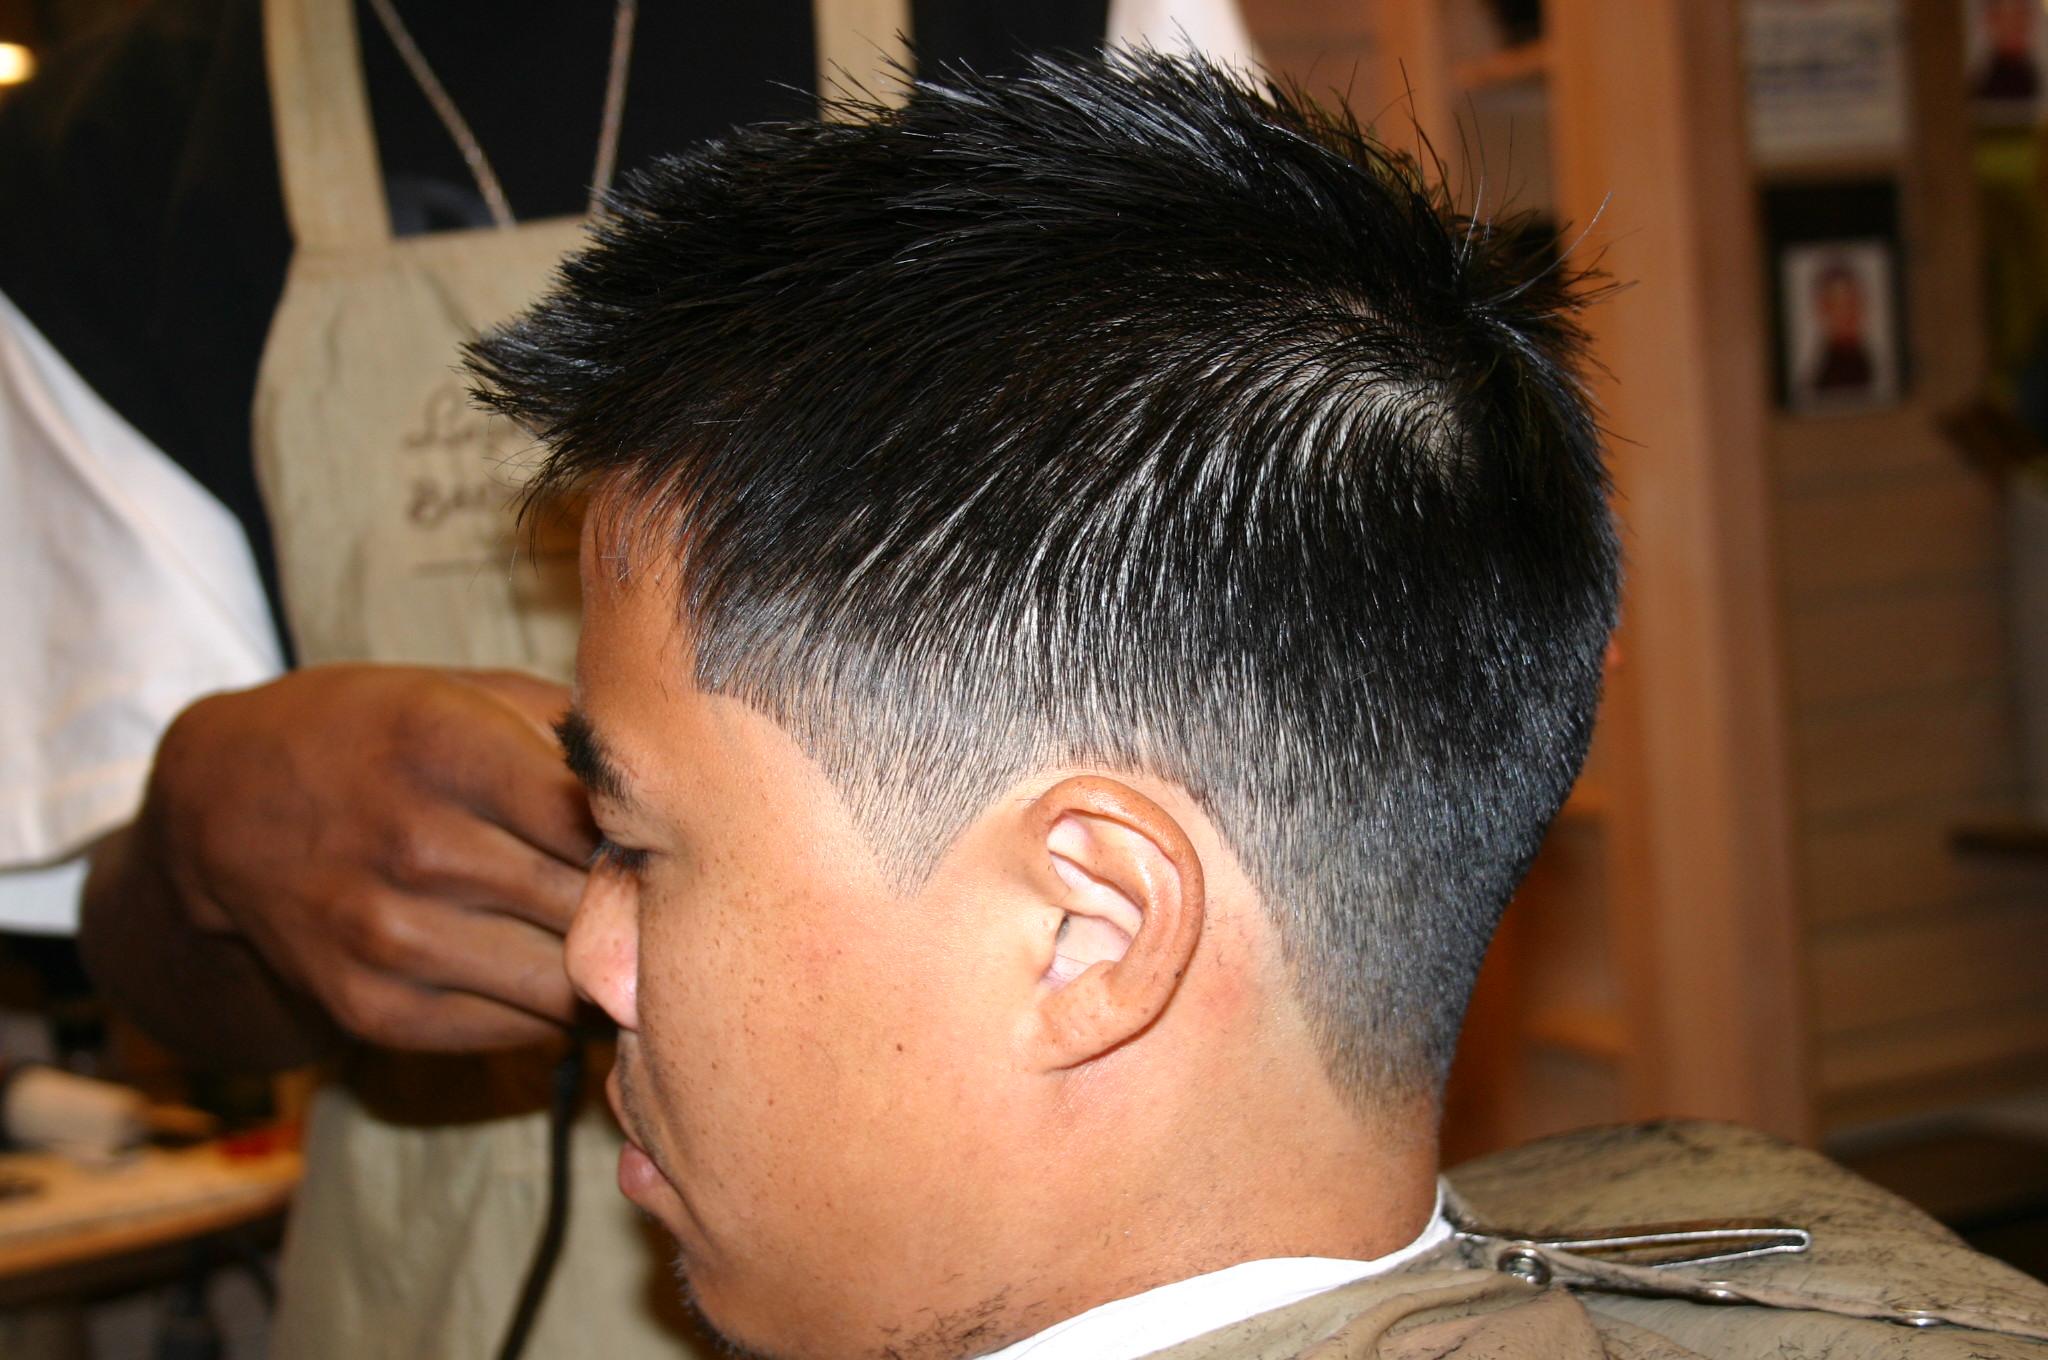 Barbers Cut : Jeremy Lin Cut The New VIP Barbershop aka Craigs VIP Cuts